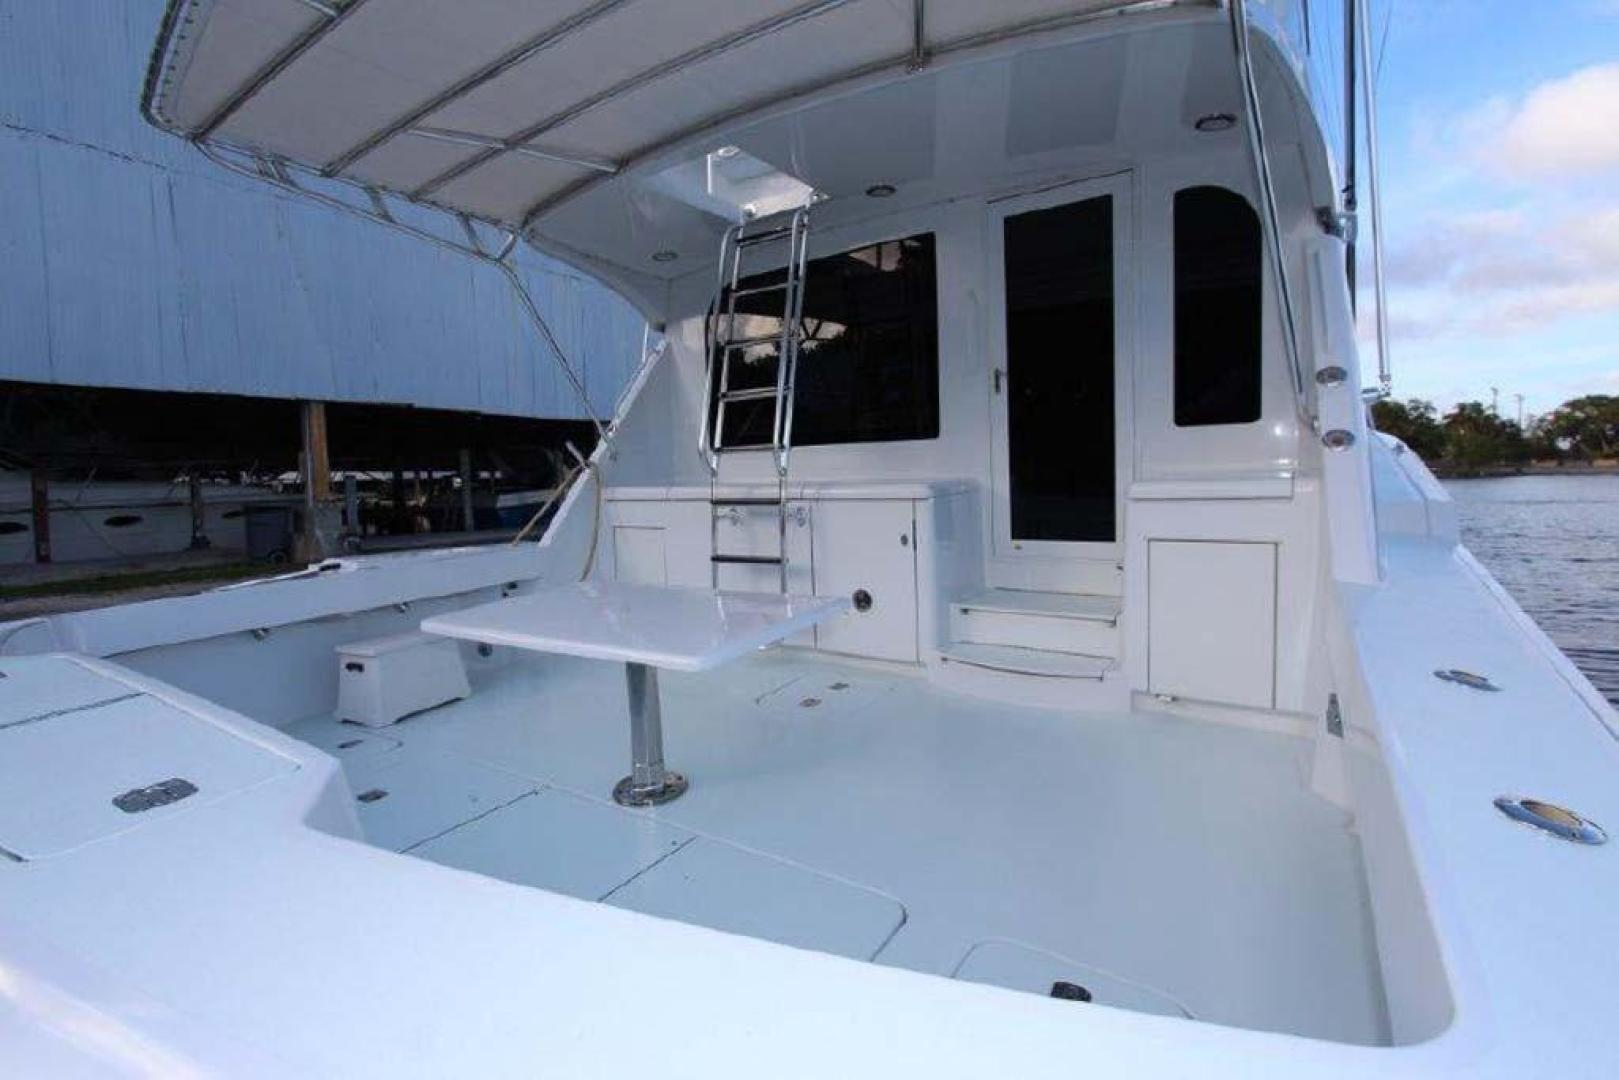 Hatteras-Enclosed Bridge 2002-El Bohemio Miami-Florida-United States-Cockpit-369533 | Thumbnail